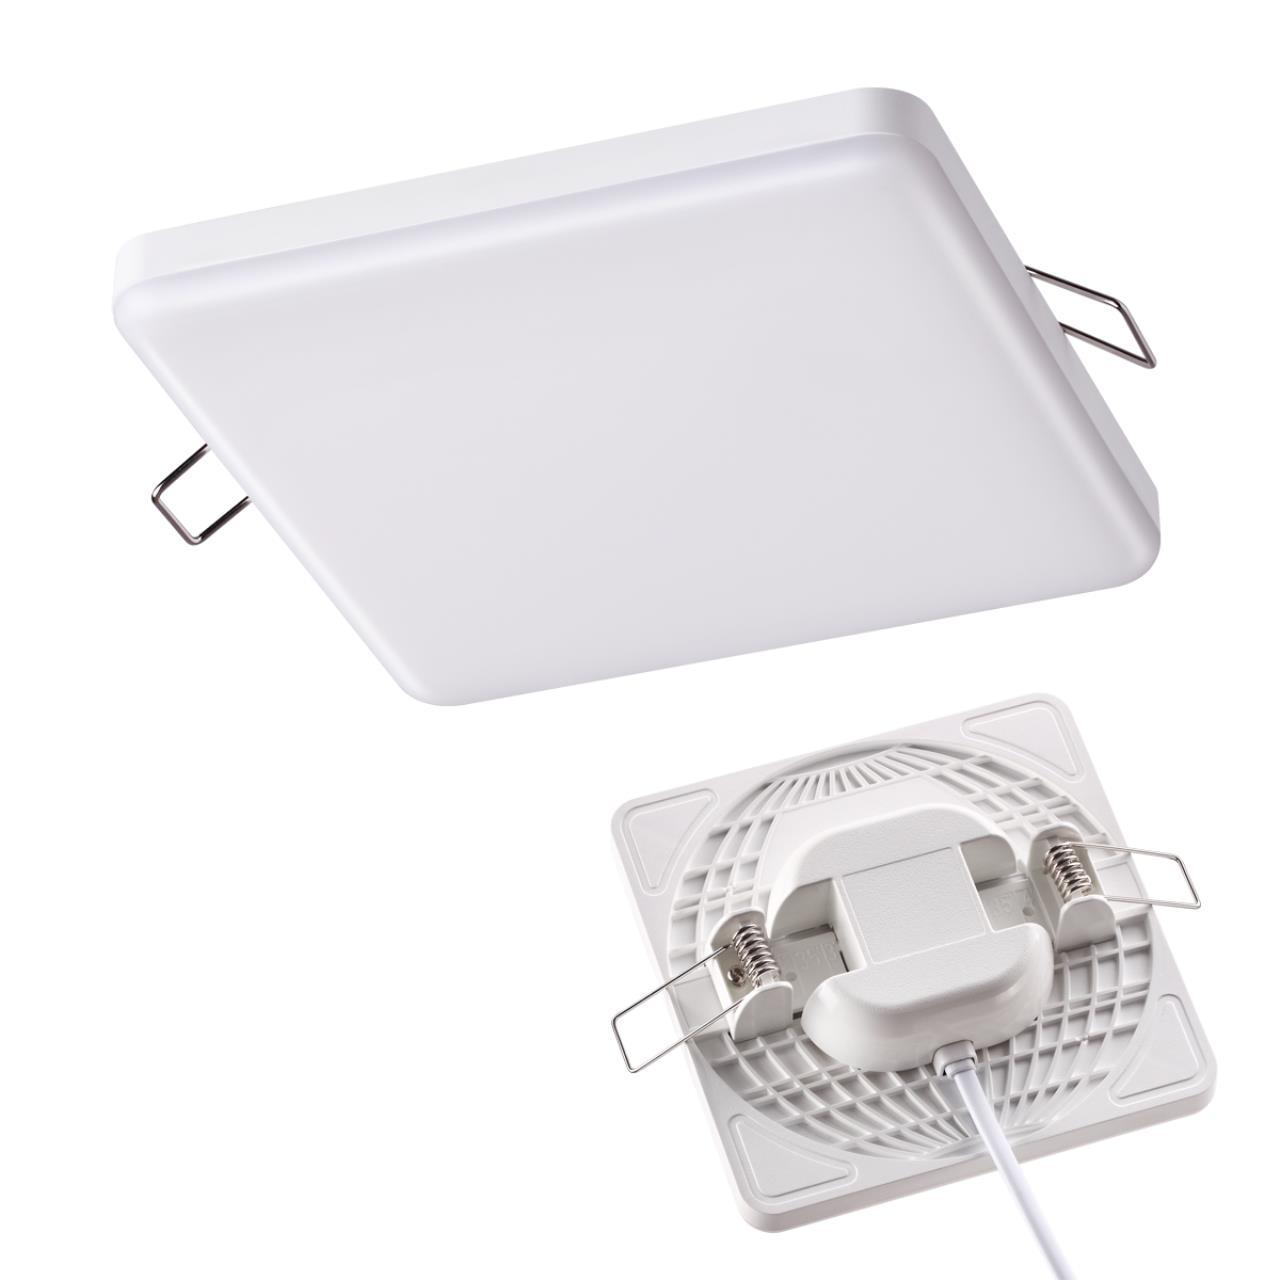 358147 SPOT NT19 078 белый Встраиваемый светильник IP20 LED 3000K 12W 85 - 265V MOON